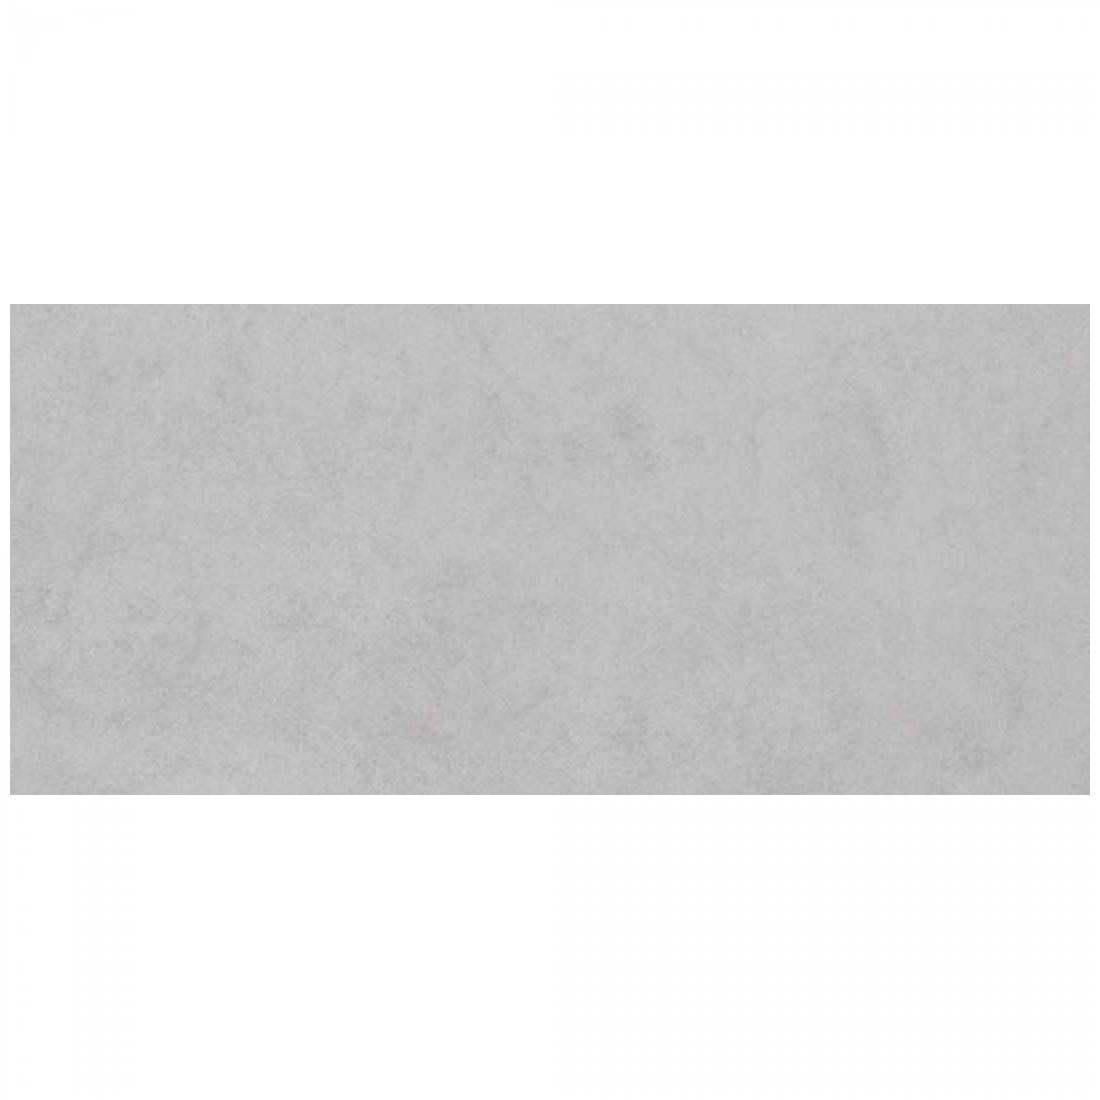 Loft 30x60 Silver Matt 1